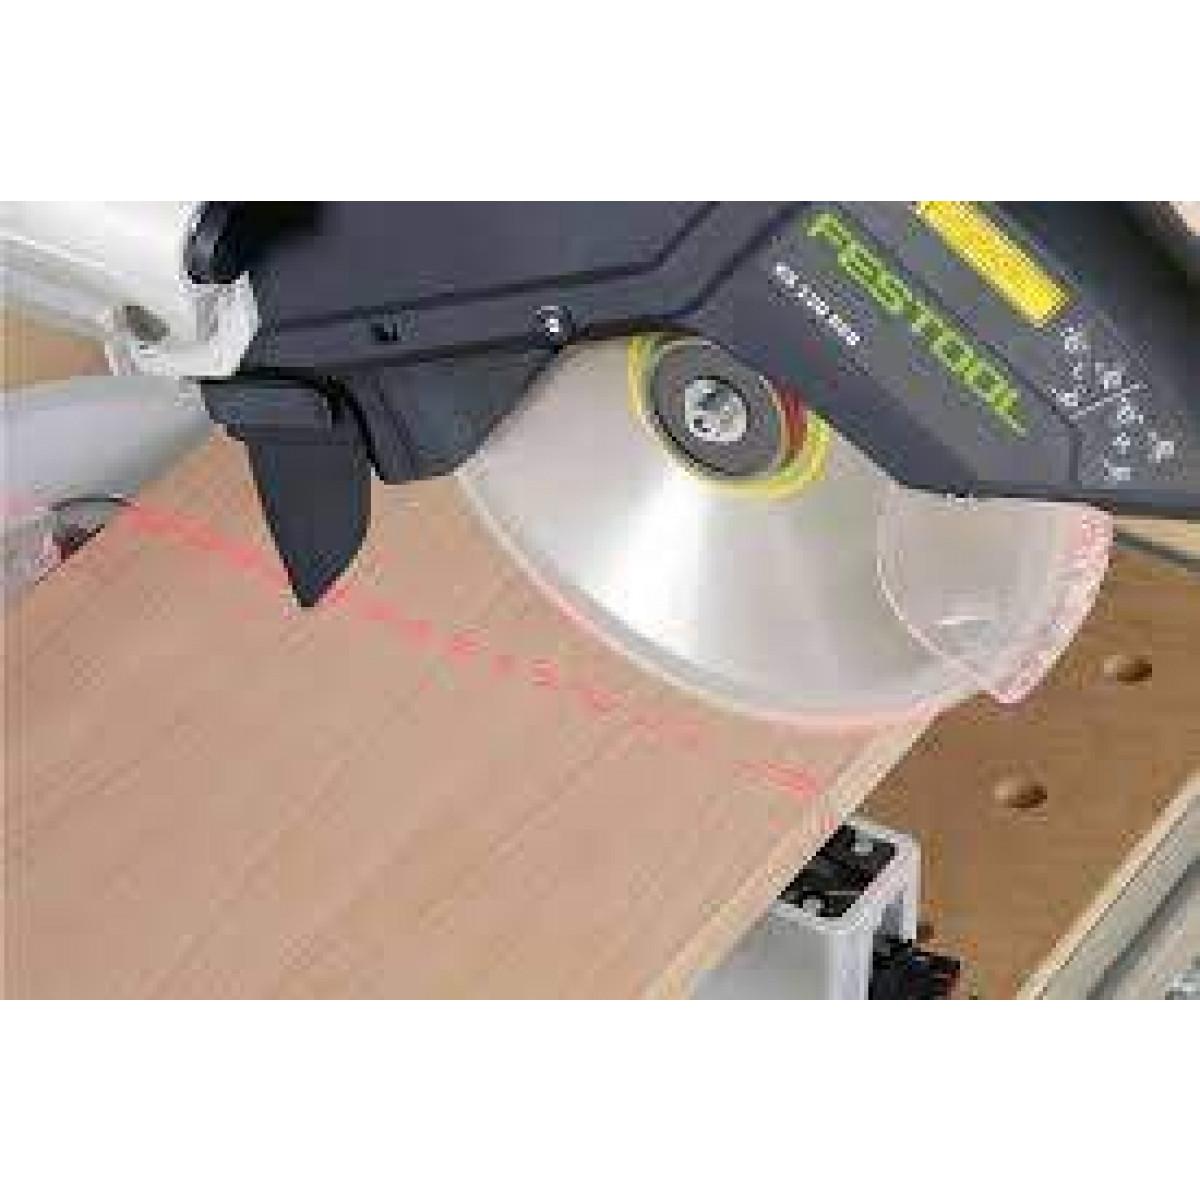 Festool FES-575306 Kapex KS 120 REB Sliding Compound Miter Saw (2019 Model)